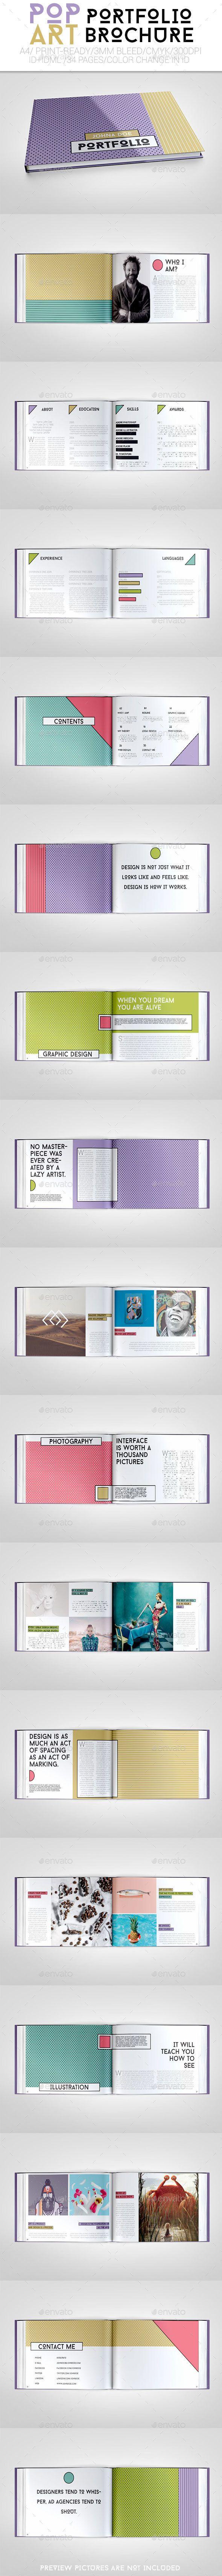 Pop Art Portfolio Brochure Template InDesign INDD. Download here: http://graphicriver.net/item/pop-art-portfolio-brochure/14741645?ref=ksioks